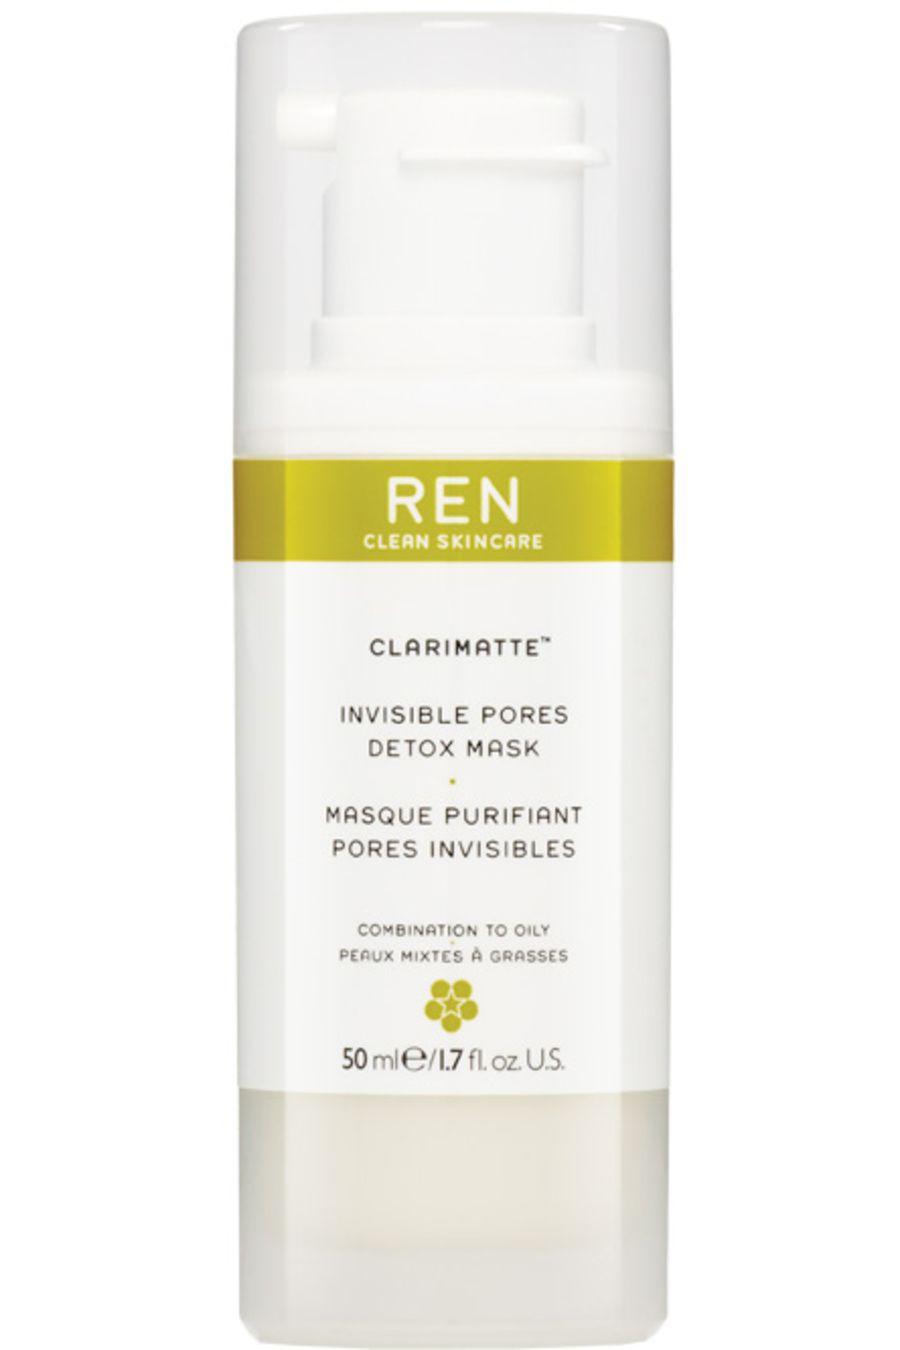 Blissim : REN - Masque purifiant anti-pore - Masque purifiant anti-pore